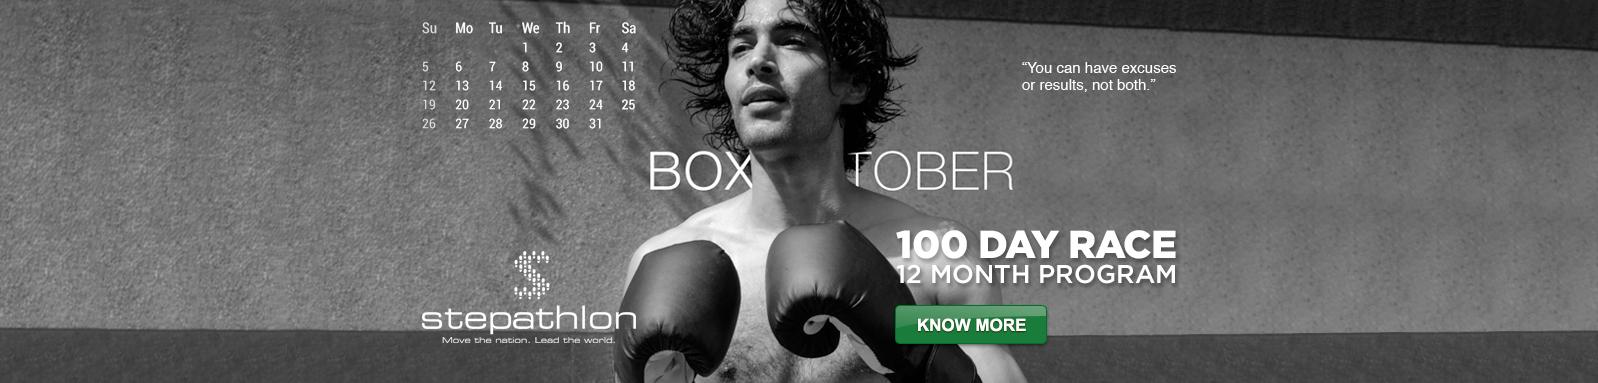 October - Boxtober - Stepathlon 2014 Calendar